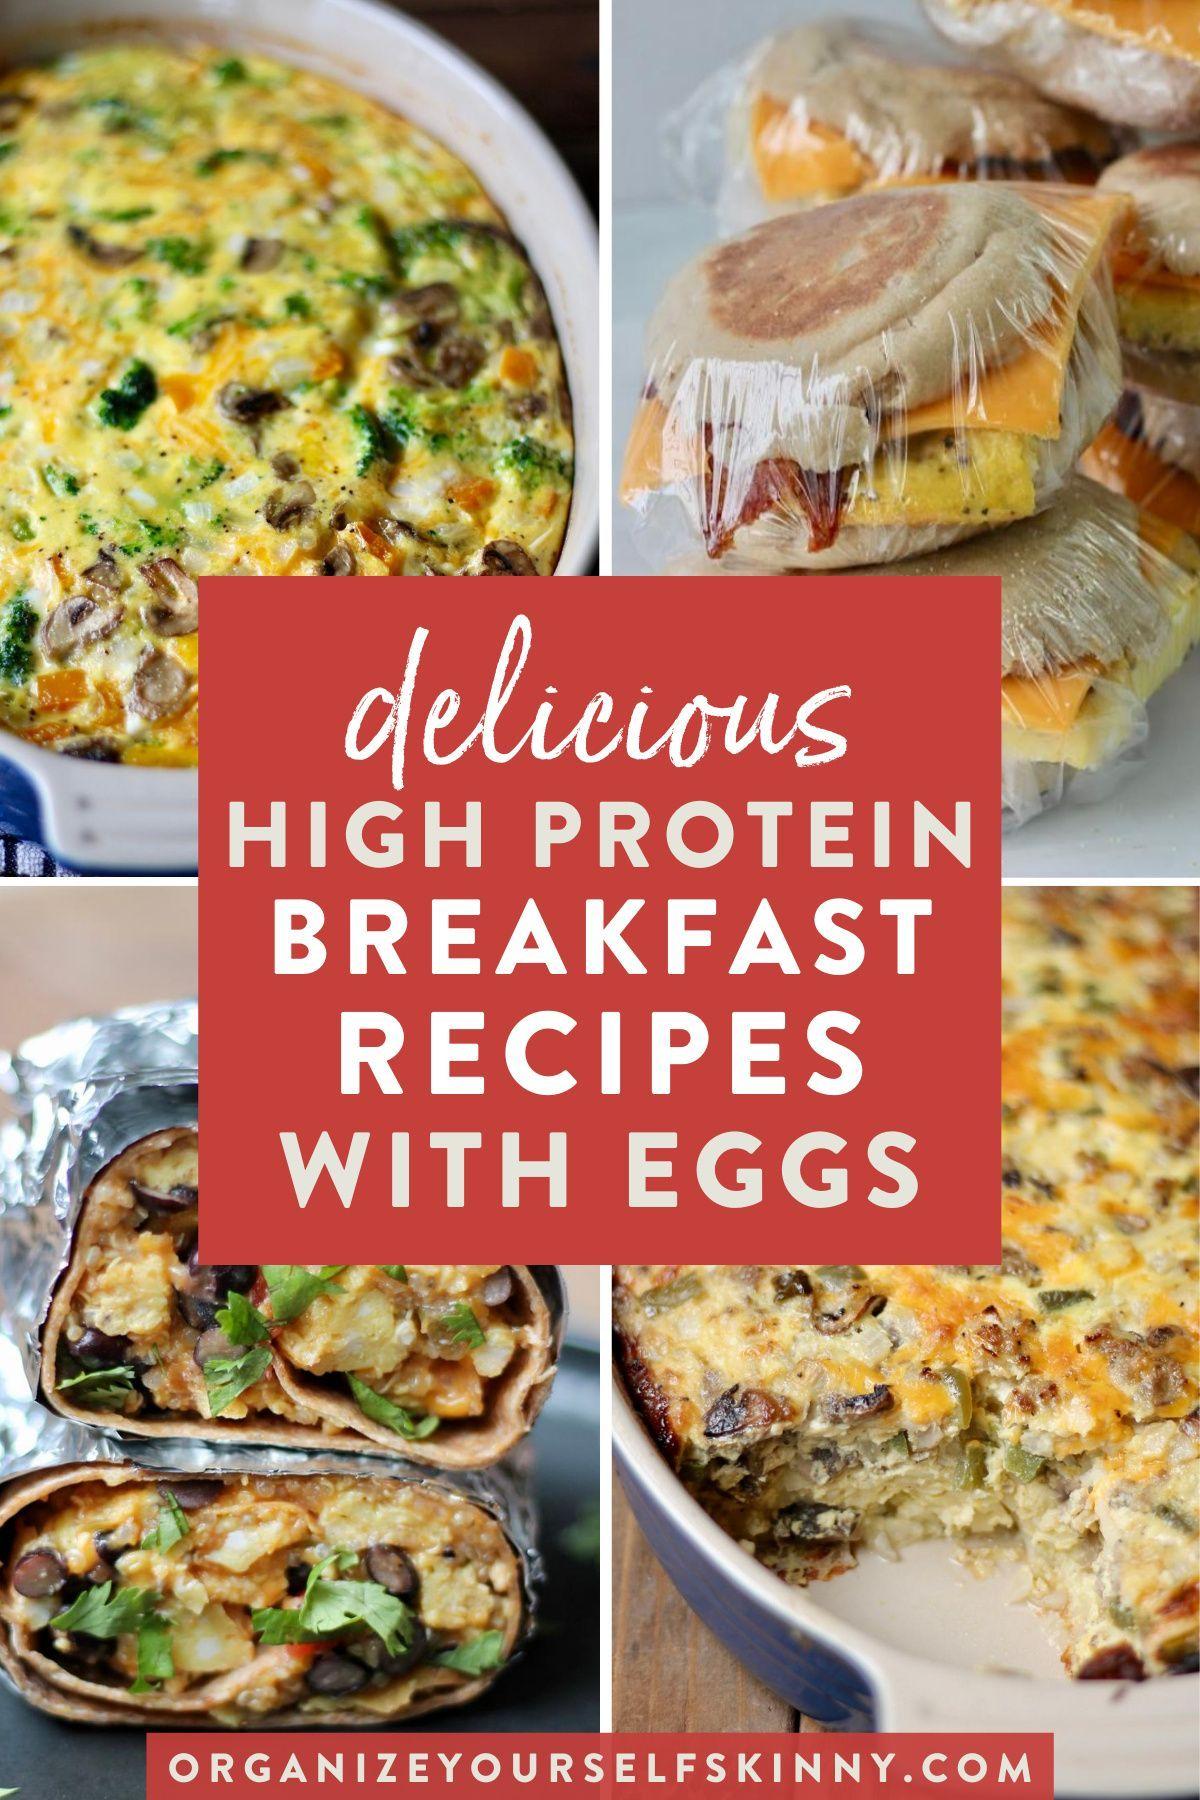 High Protein Breakfast Ideas Using Eggs Healthy Breakfast Recipes Breakfast Recipes High Protein Breakfast Recipes